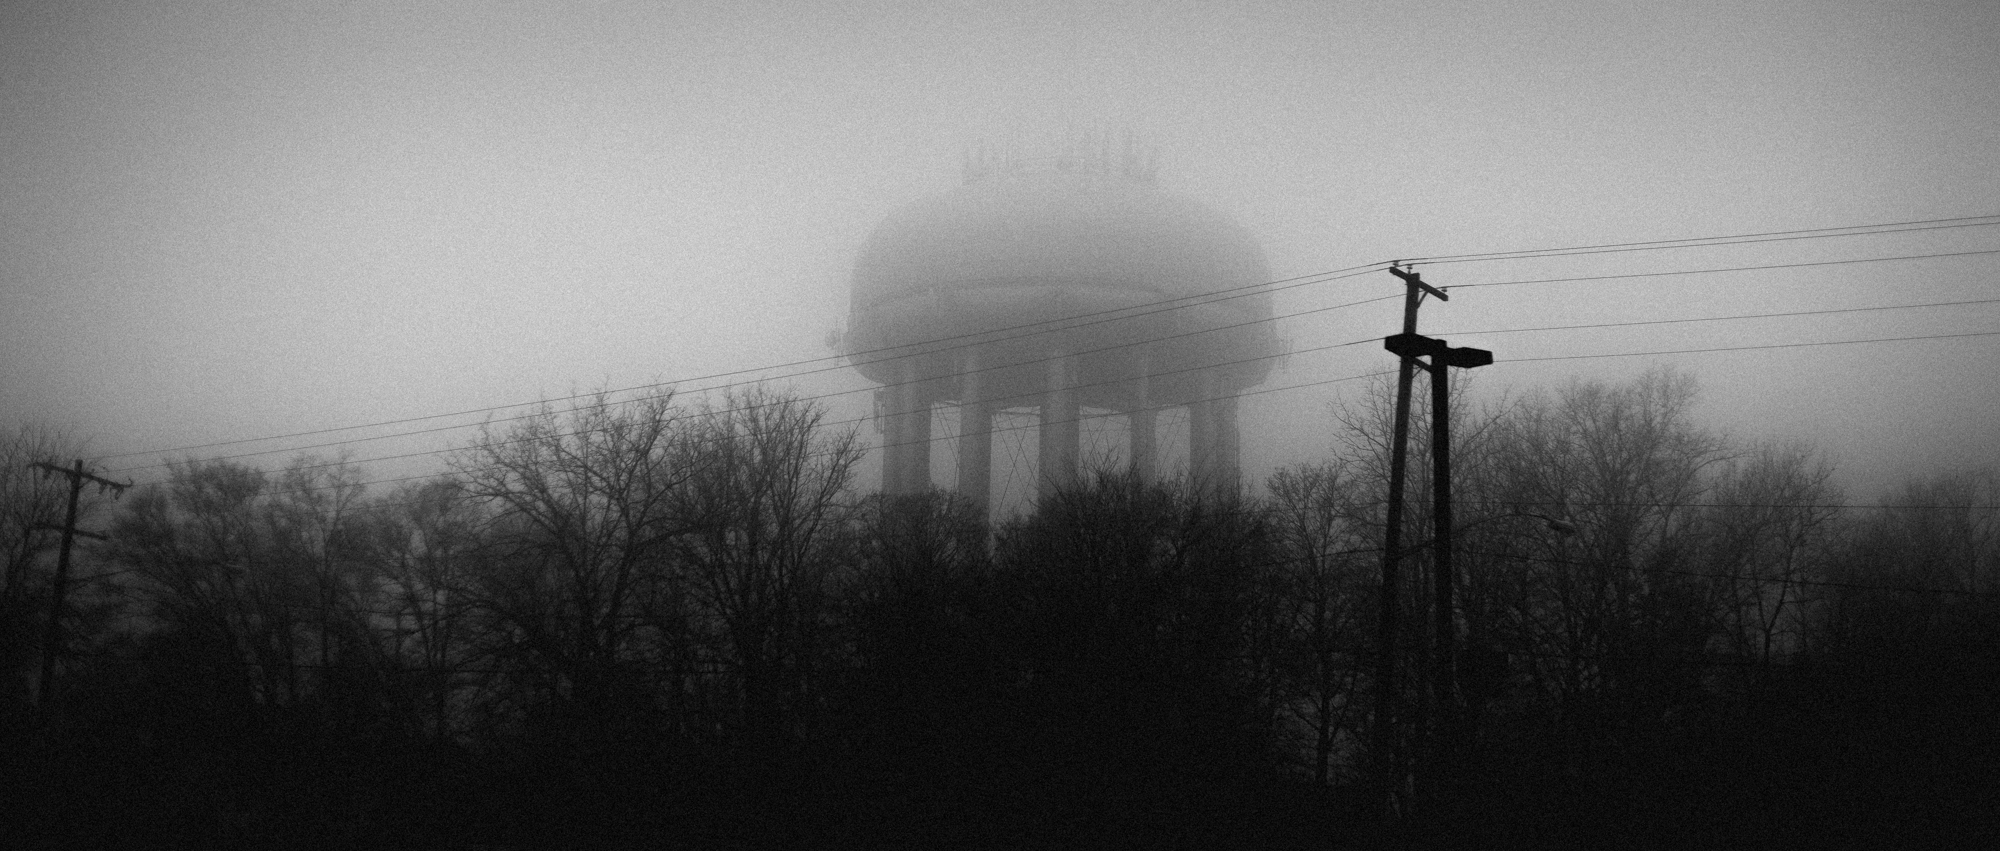 Water tower | Grand Rapids, MI